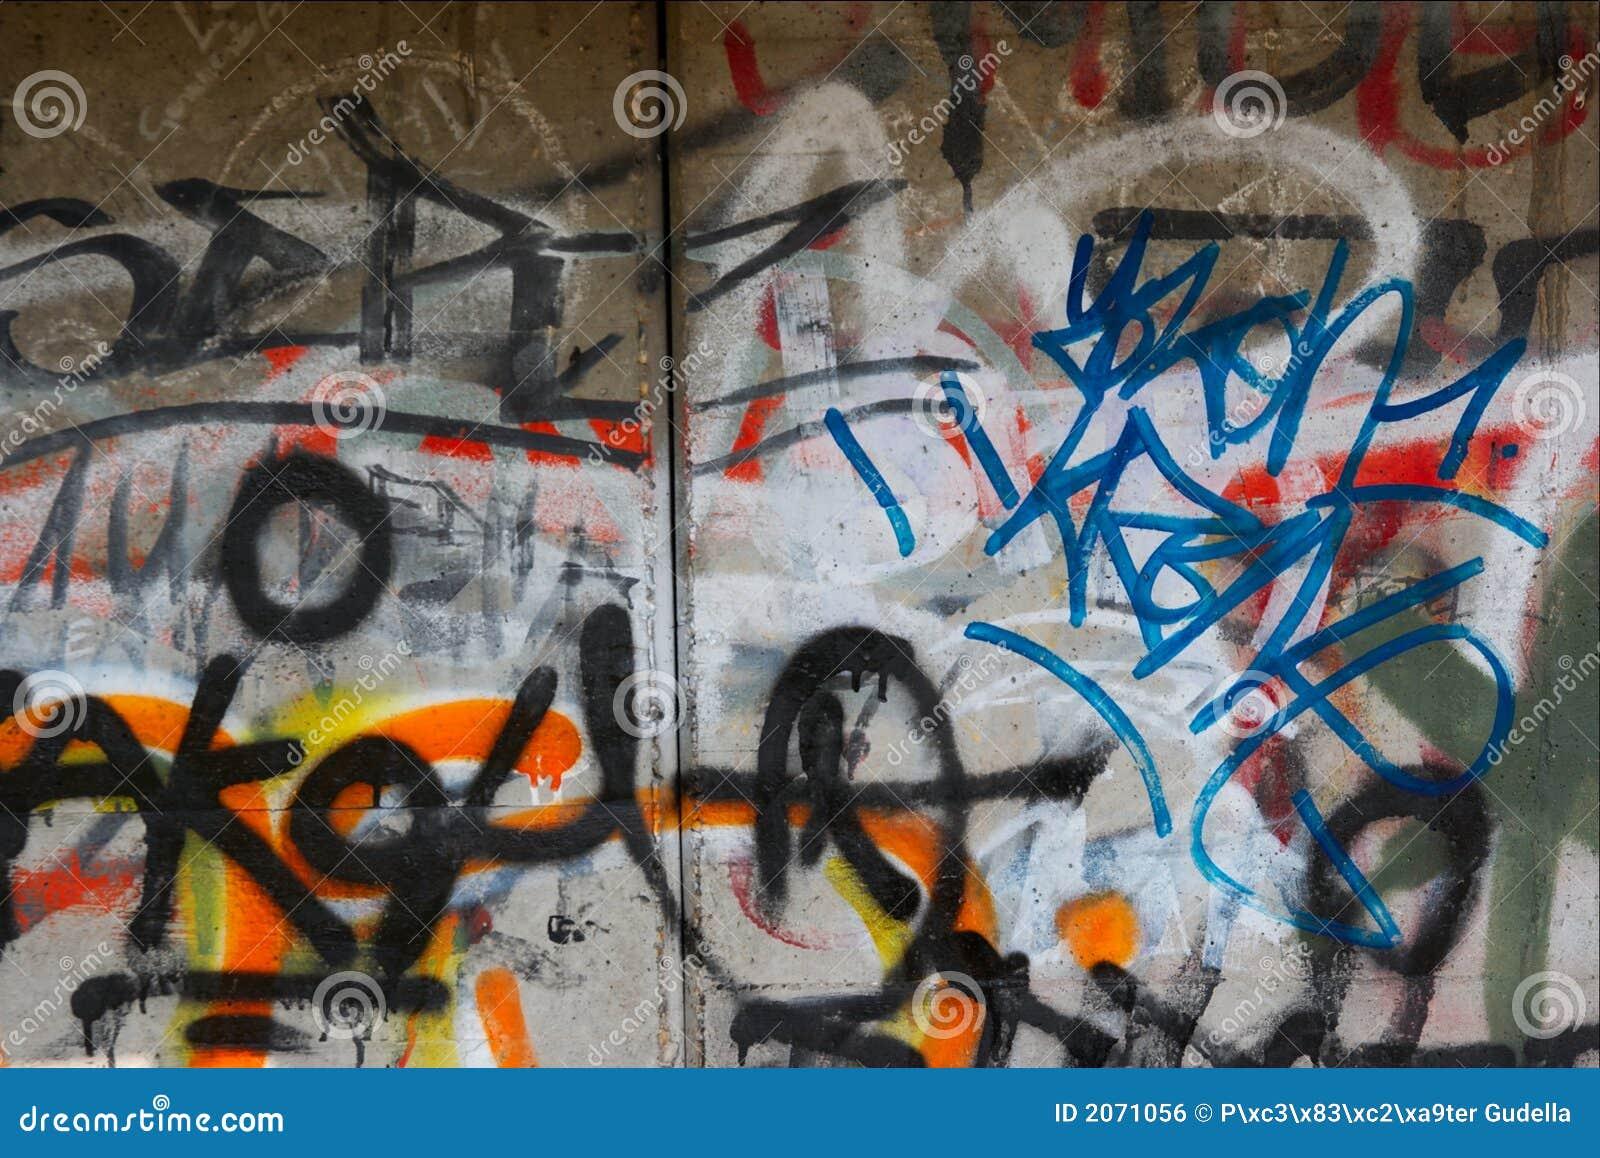 Cement Wall Graffiti : Graffiti royalty free stock image